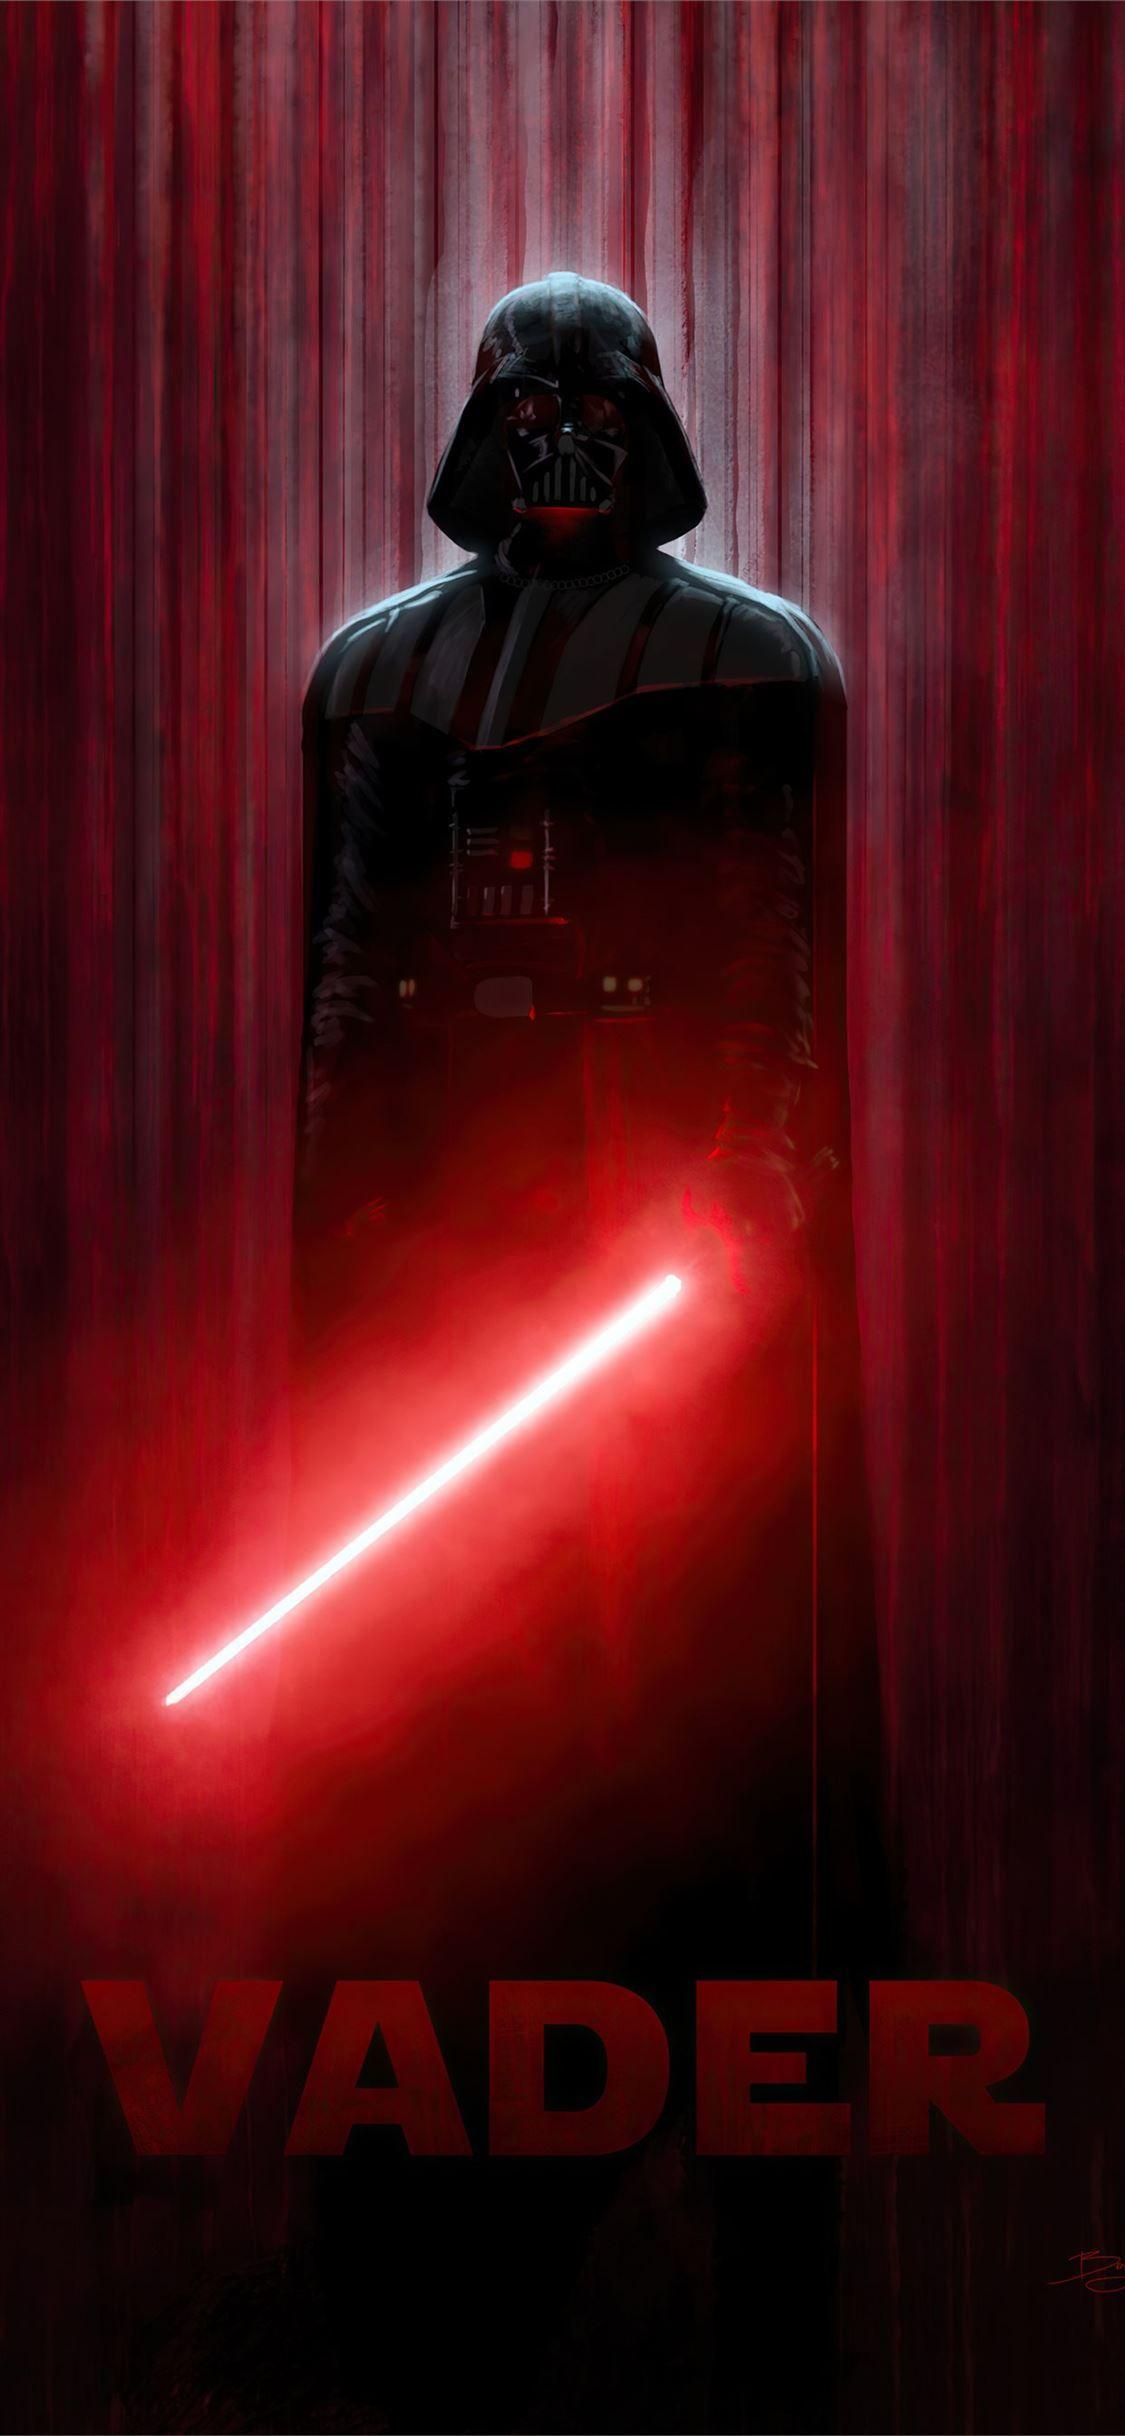 Darth Vader 4k Iphone Wallpapers Wallpaper Cave